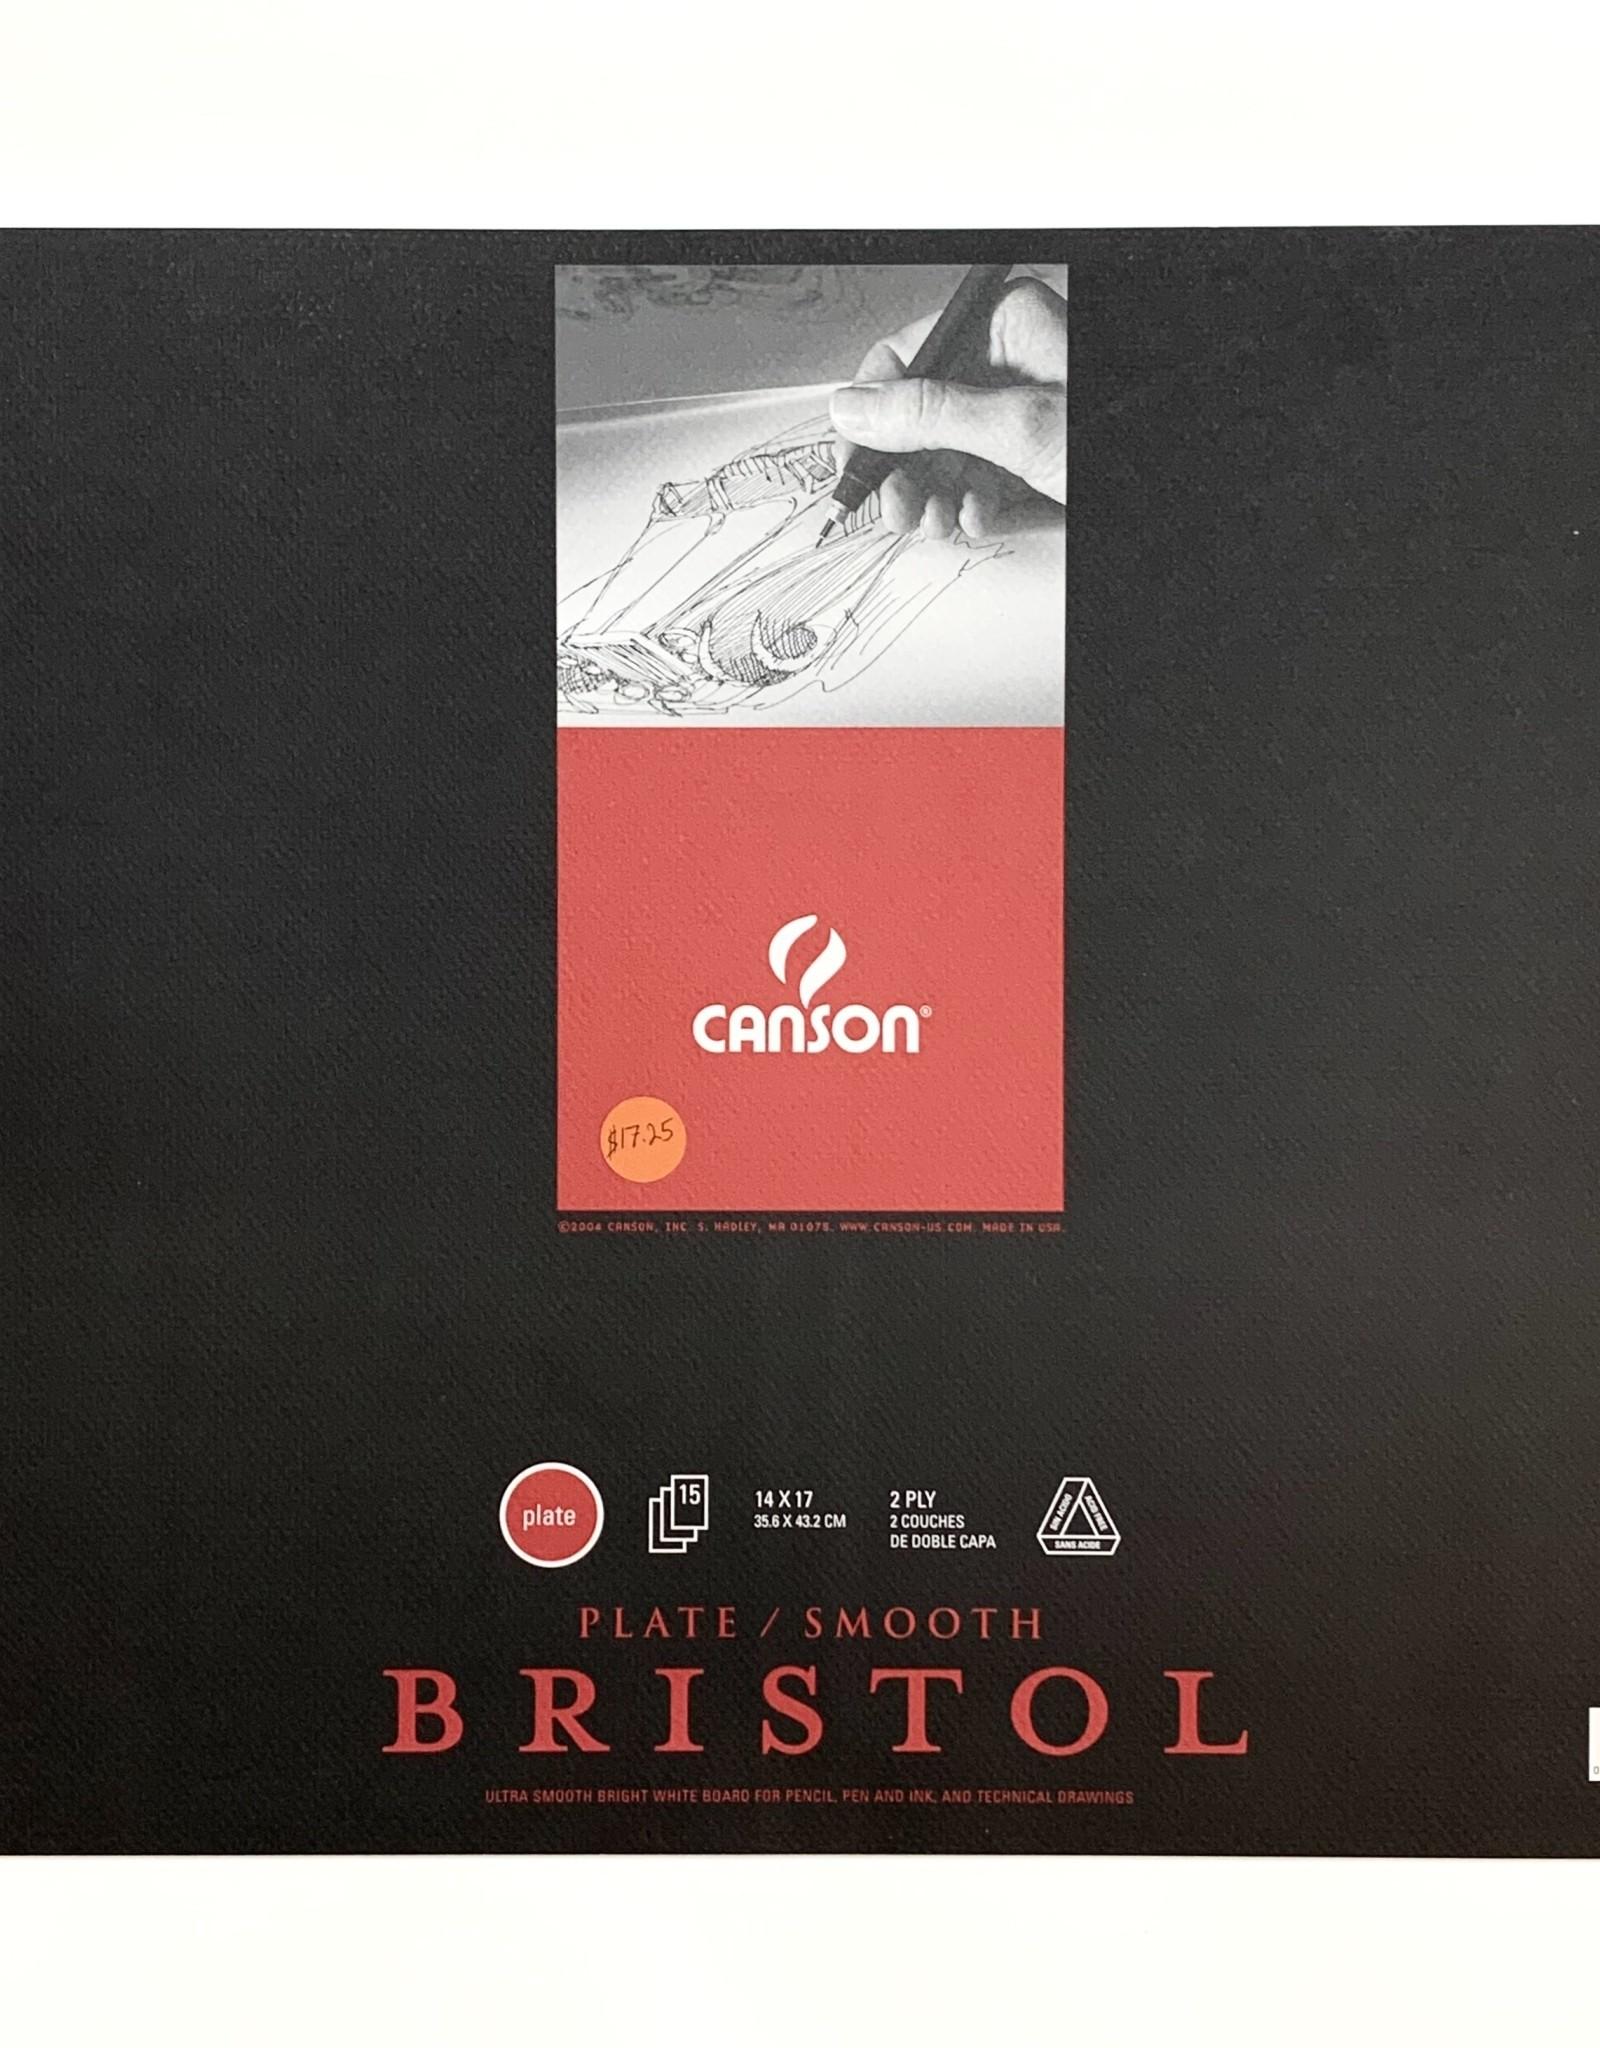 "Canson Bristol Smooth, 15 Sheet Pad, 14"" x 17"" 2ply"